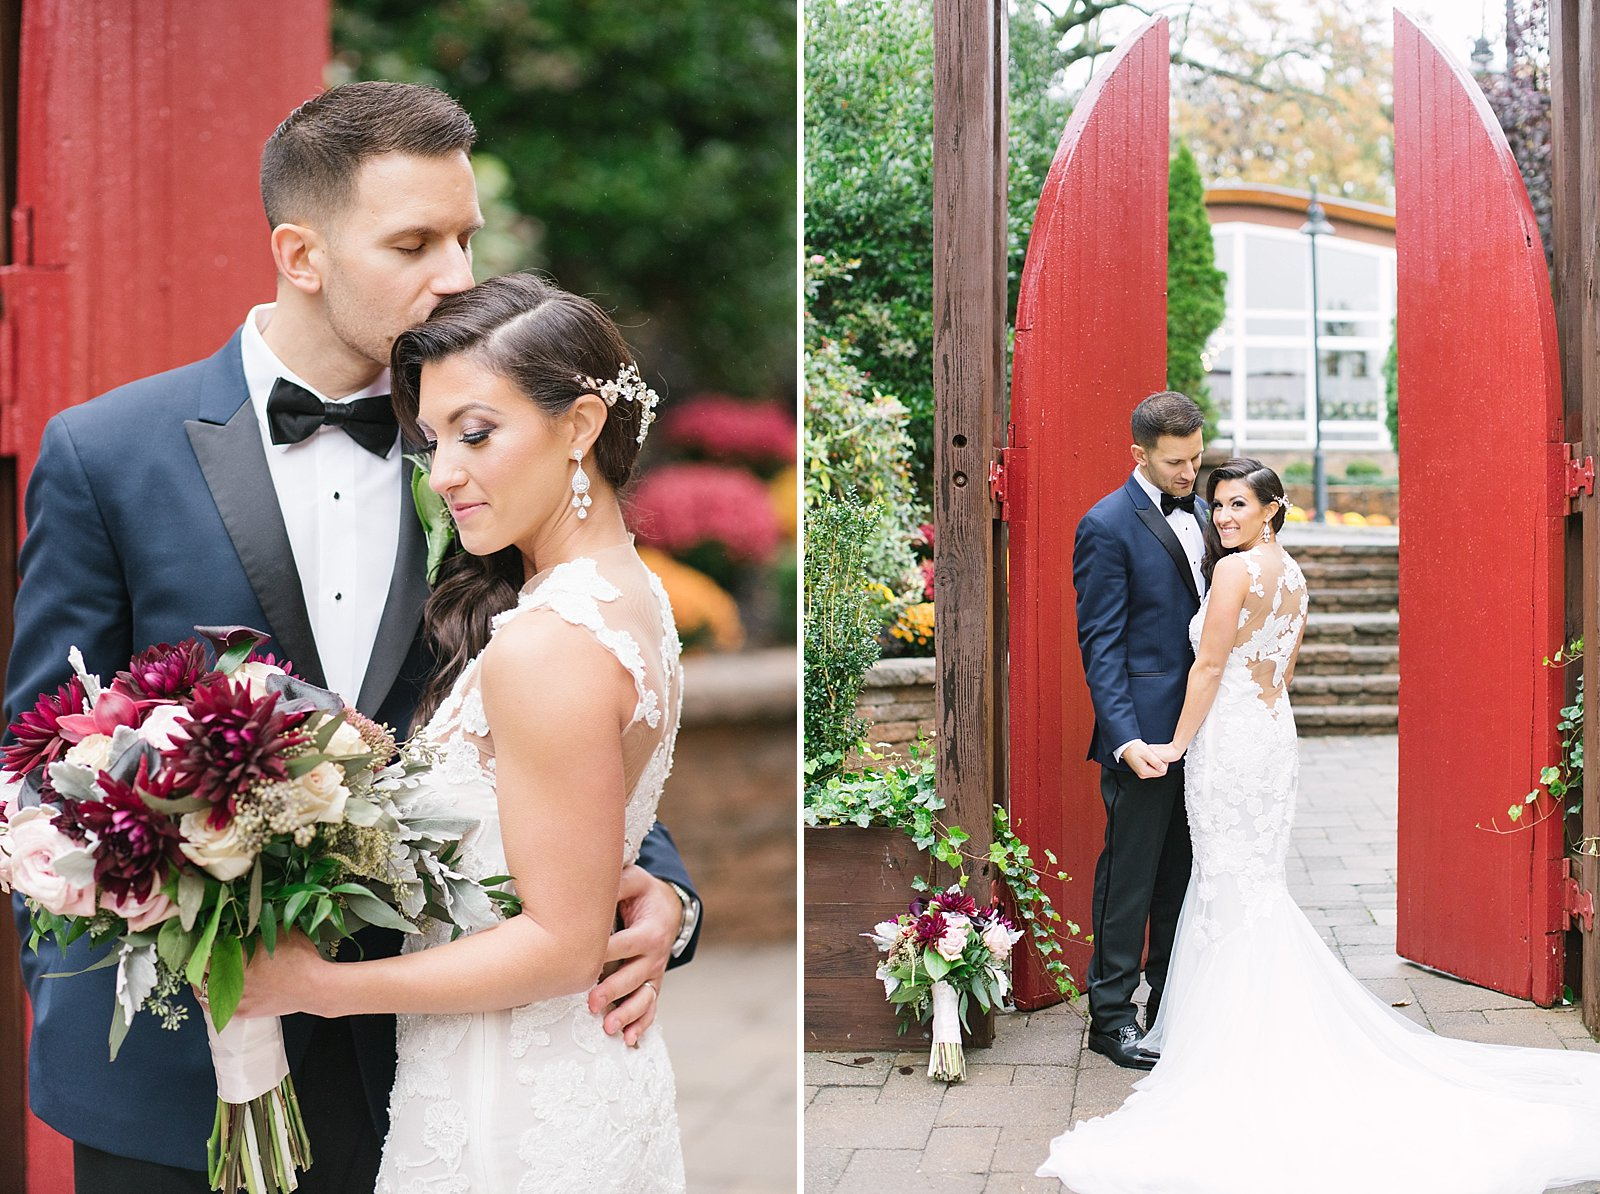 Ashley Mac Photographs   New Jersey Wedding Photographer   NJ Wedding Photographer   Stone House at Stirling Ridge Wedding Photographer   Warren NJ Wedding Photography